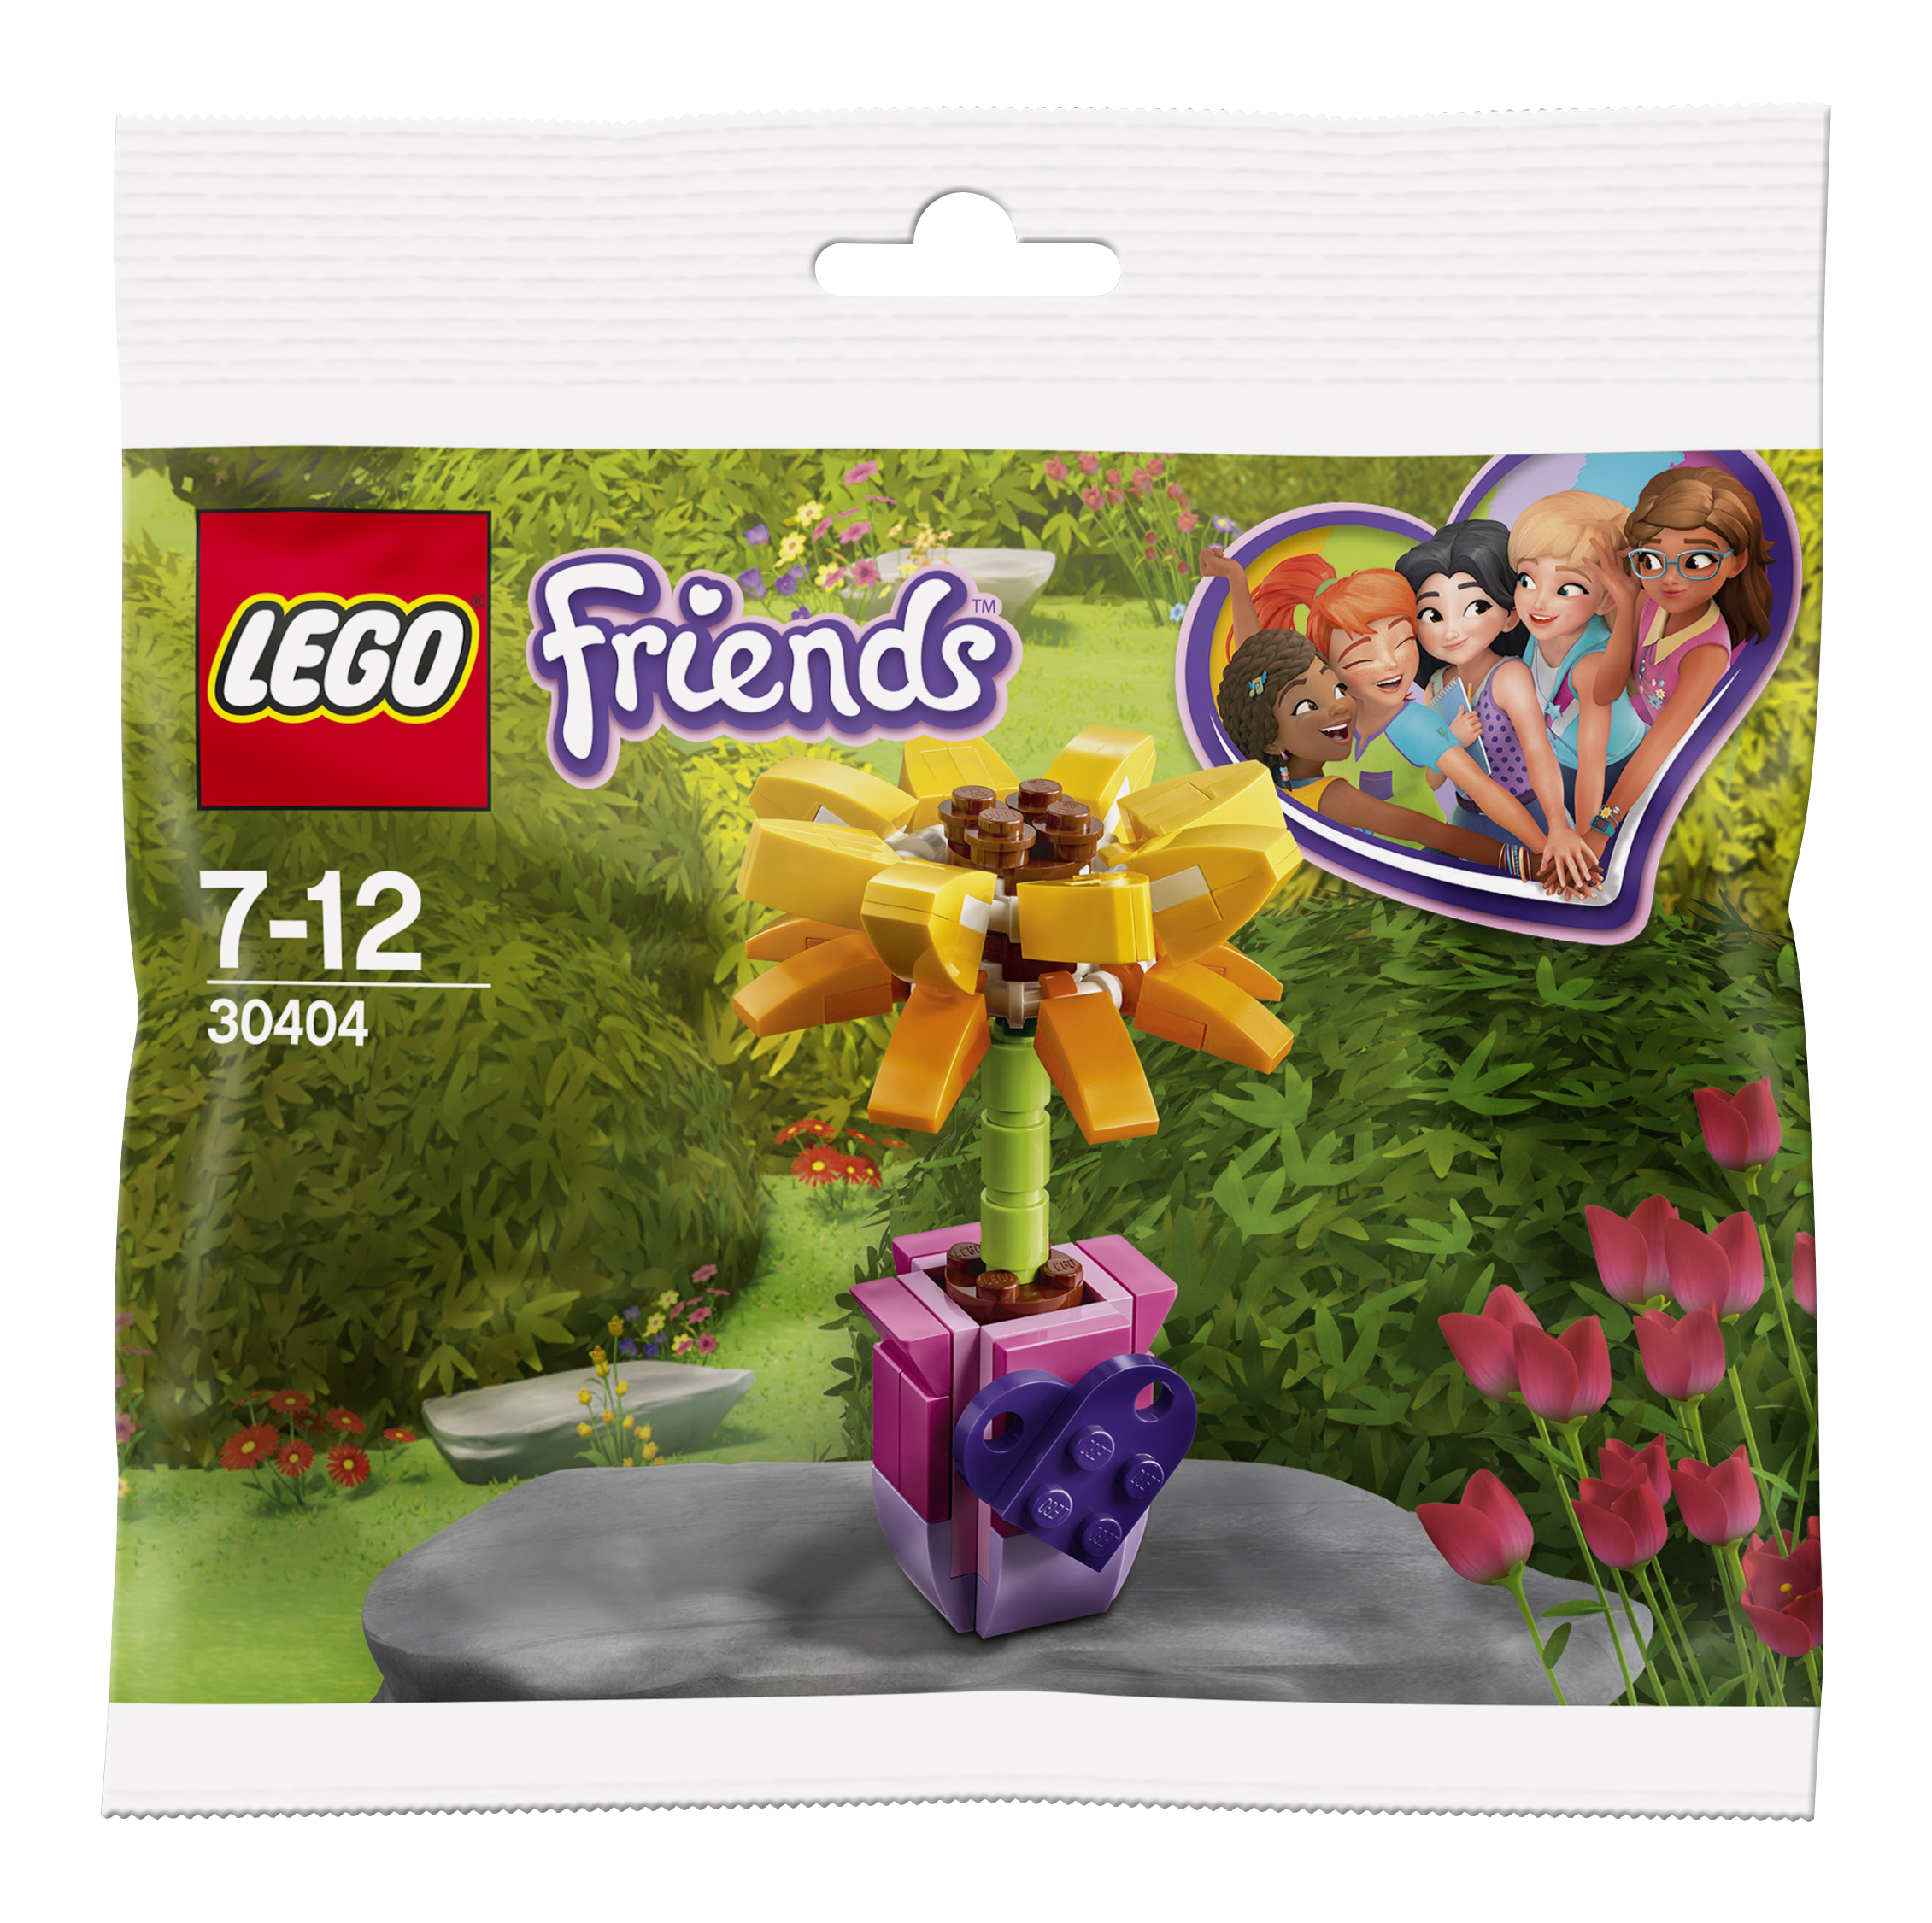 Конструктор LEGO Friends 30404 Цветок дружбы цена